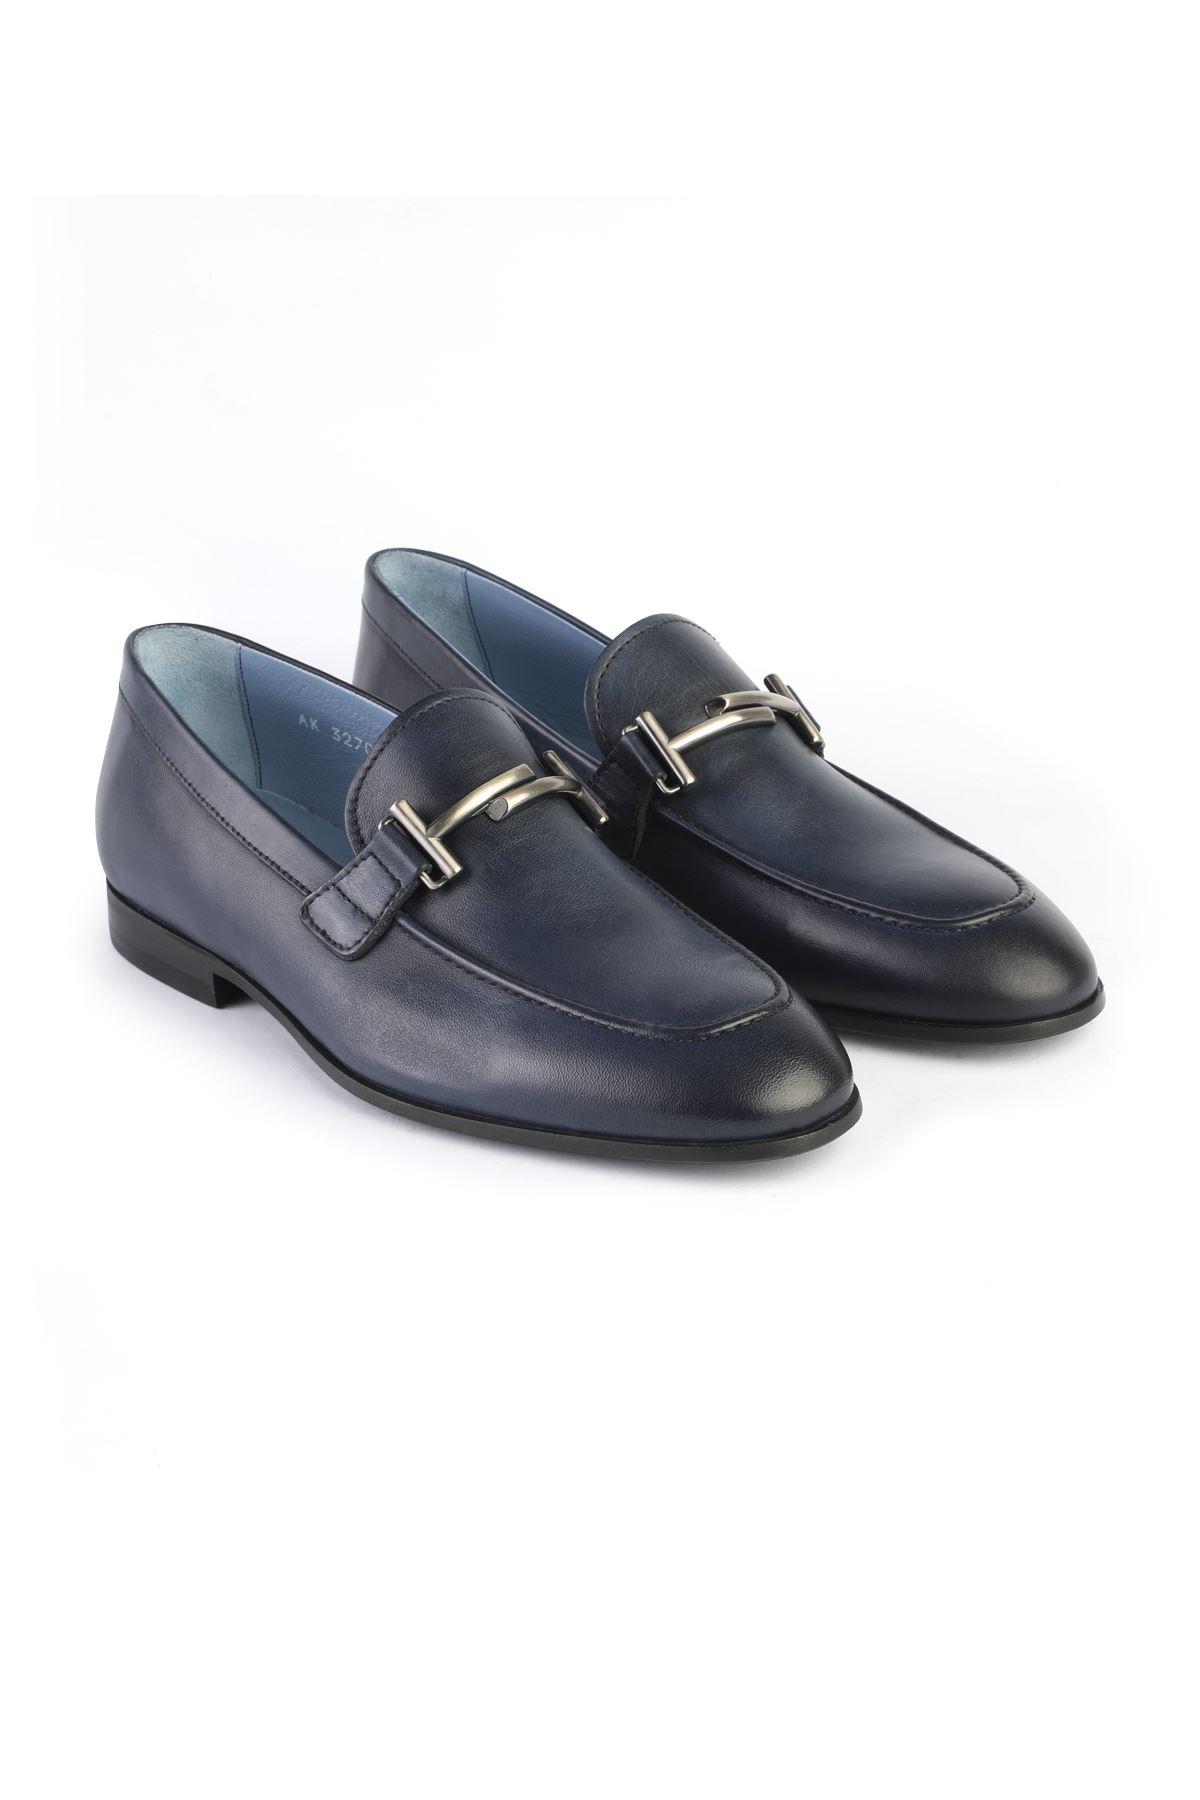 Libero 3270 Lacivert Loafer Ayakkabı